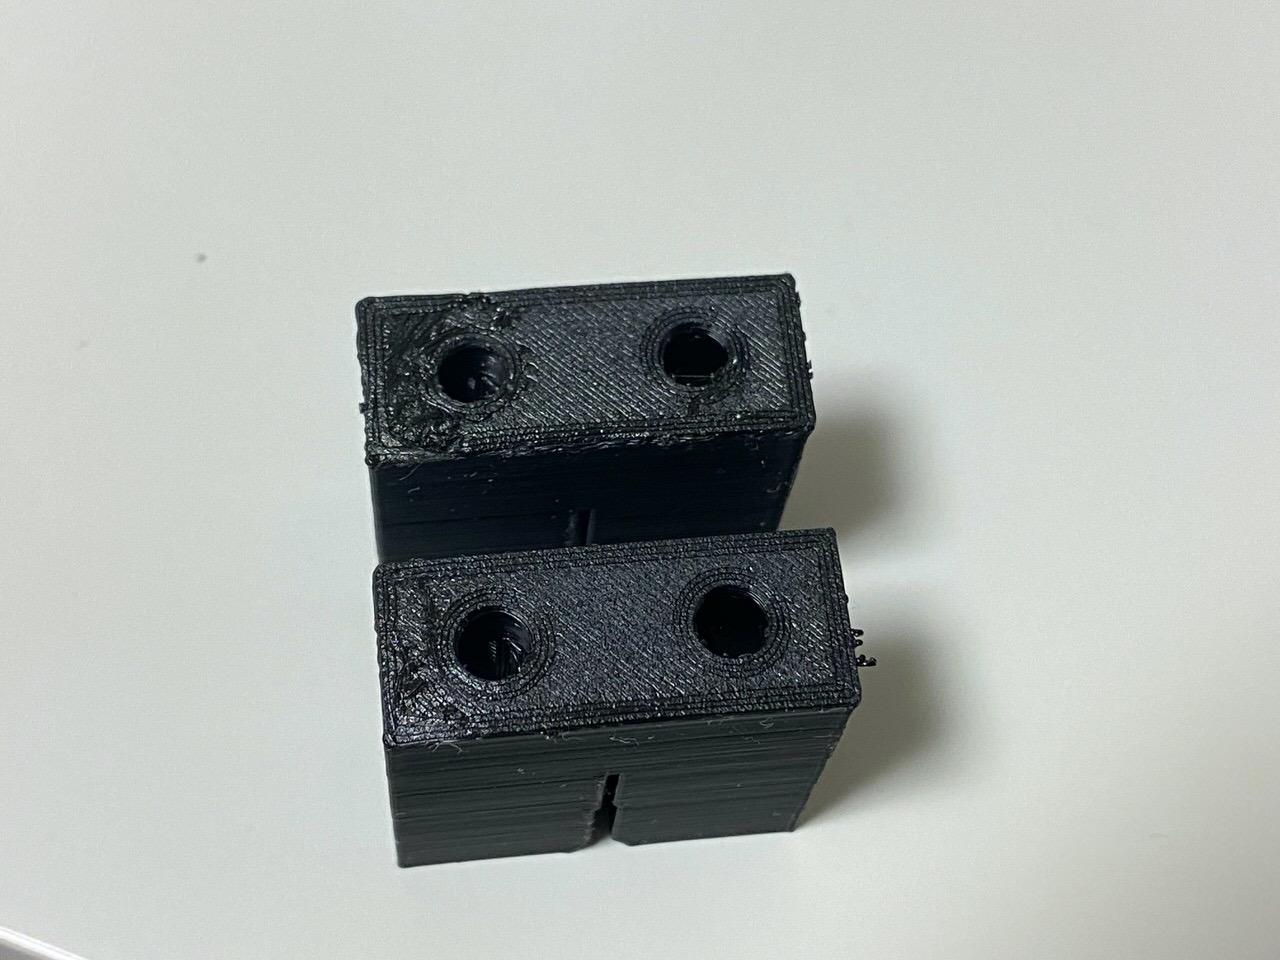 【3Dプリンター】印刷前の予熱が大事 2